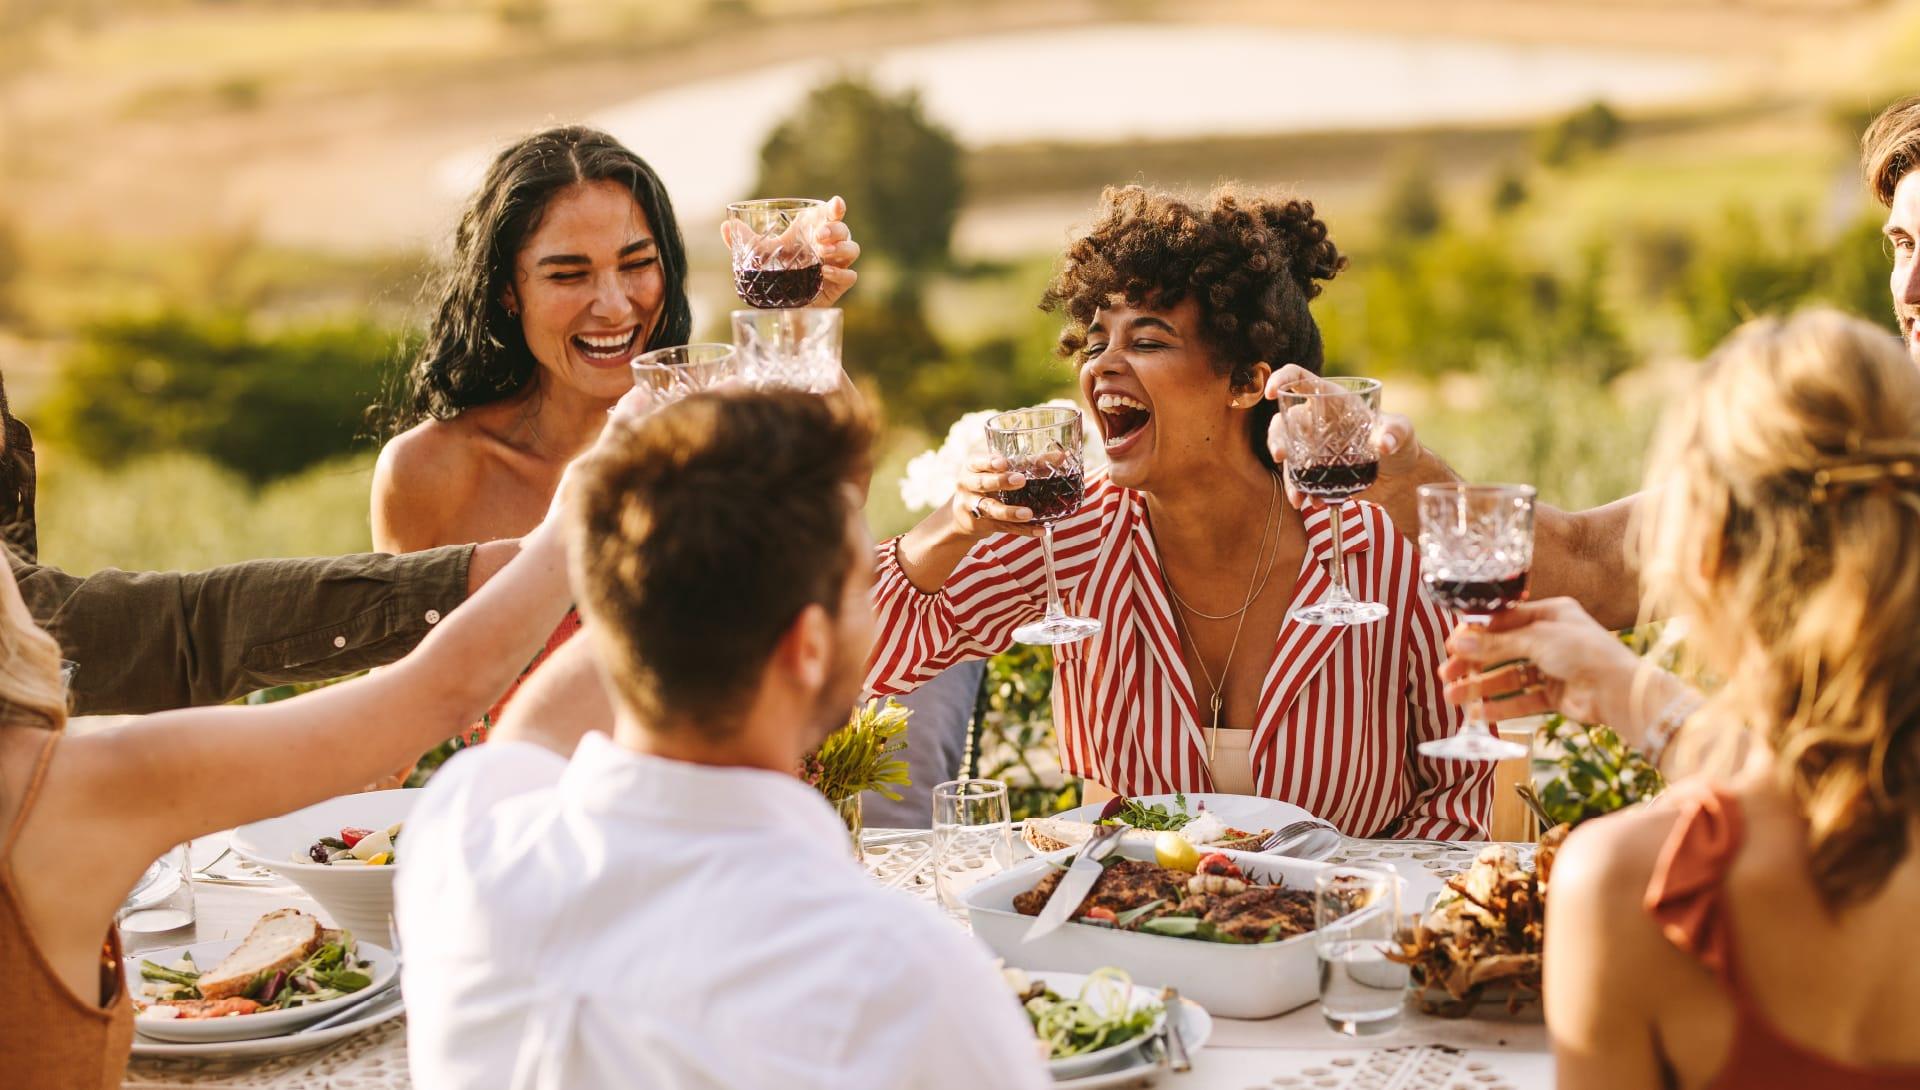 Taste Your Way Through 3 of the Best Wine Regions in the U.S